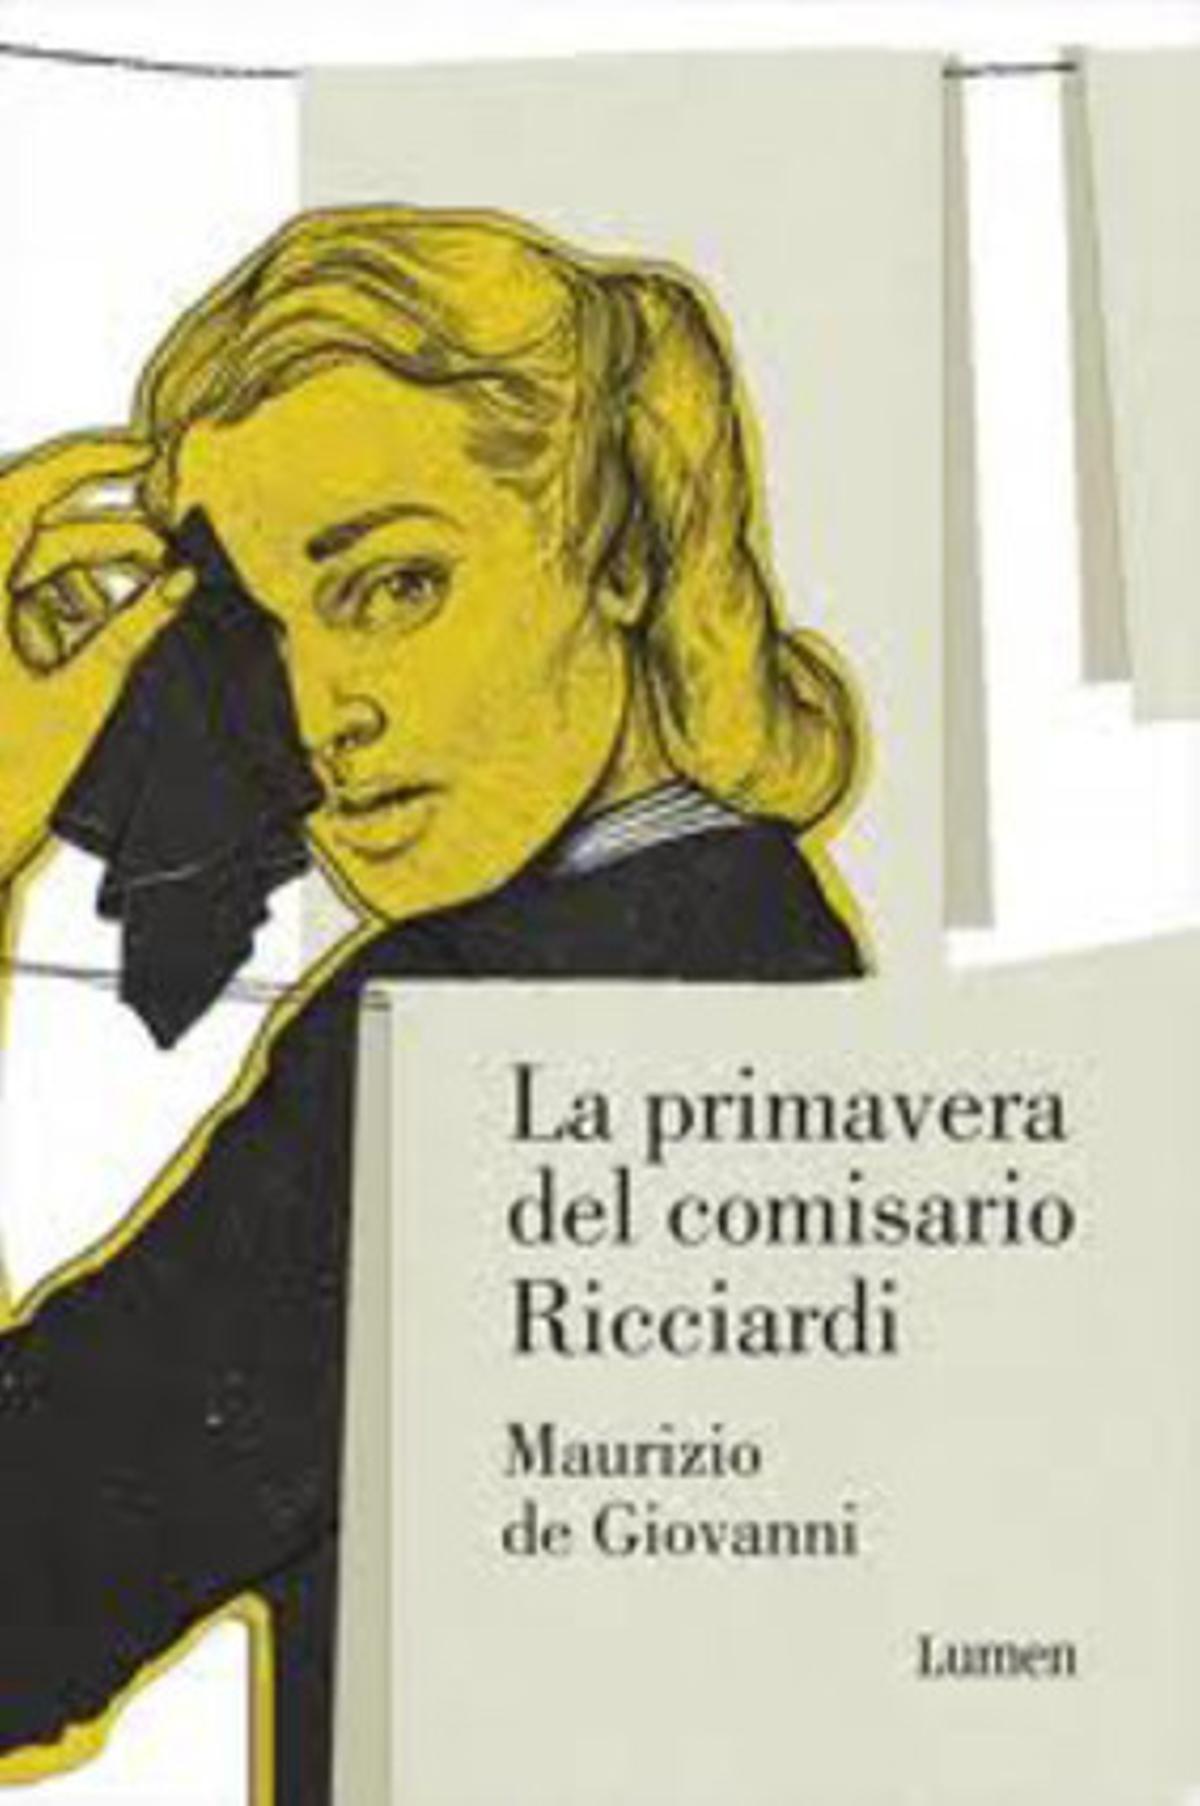 Portada de 'La primavera del comisario Ricciardi', de Maurizio de Giovanni.